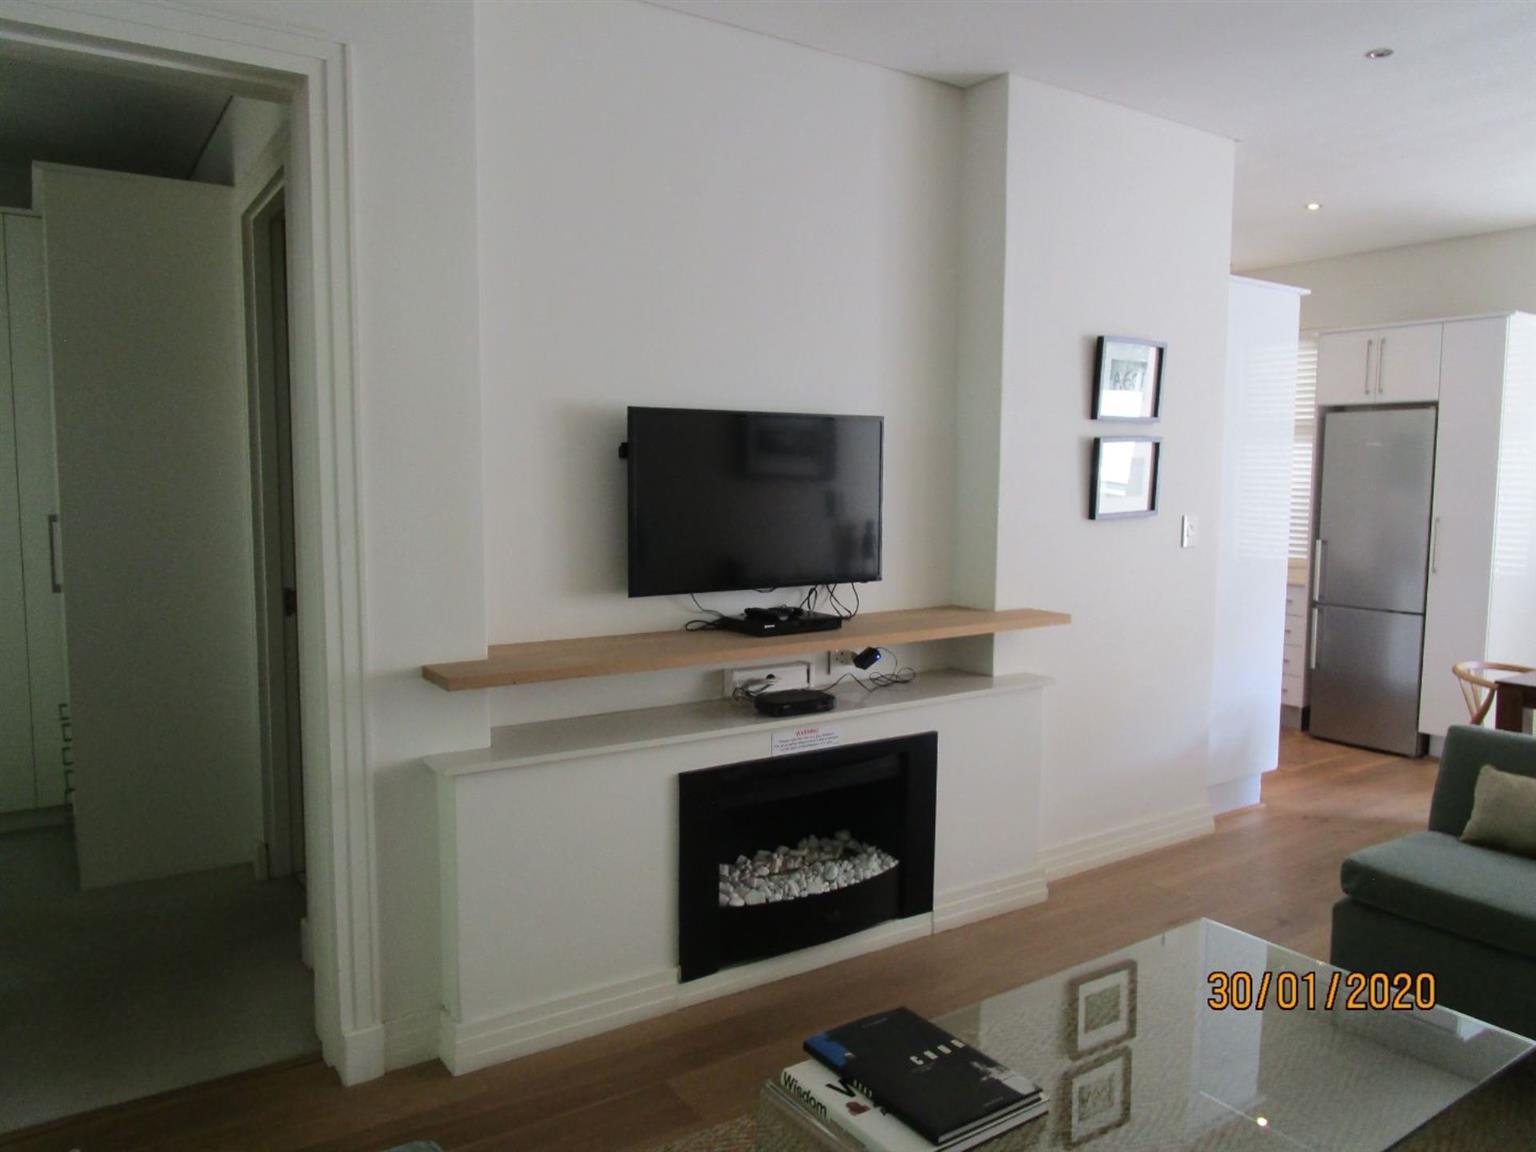 Apartment Rental Monthly in DUNKELD